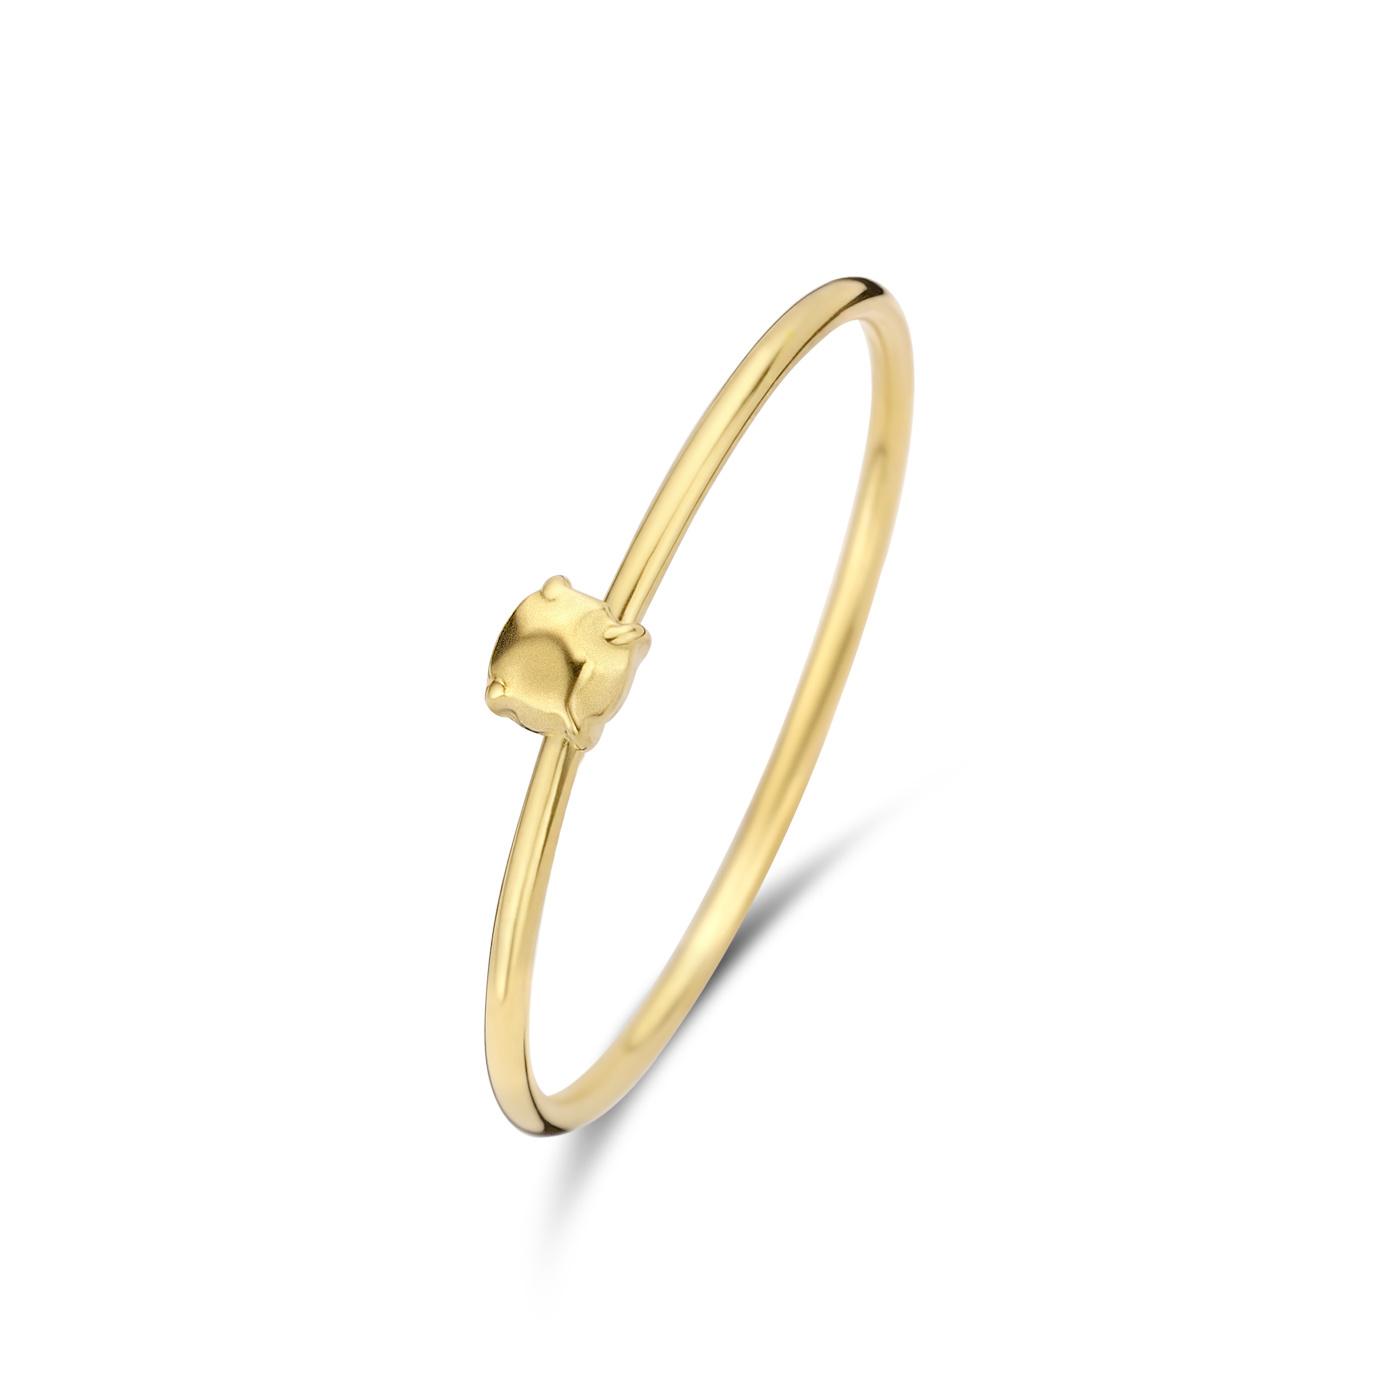 Violet Hamden Sisterhood Ring aus goldfarbenem 925 Sterlingsilber